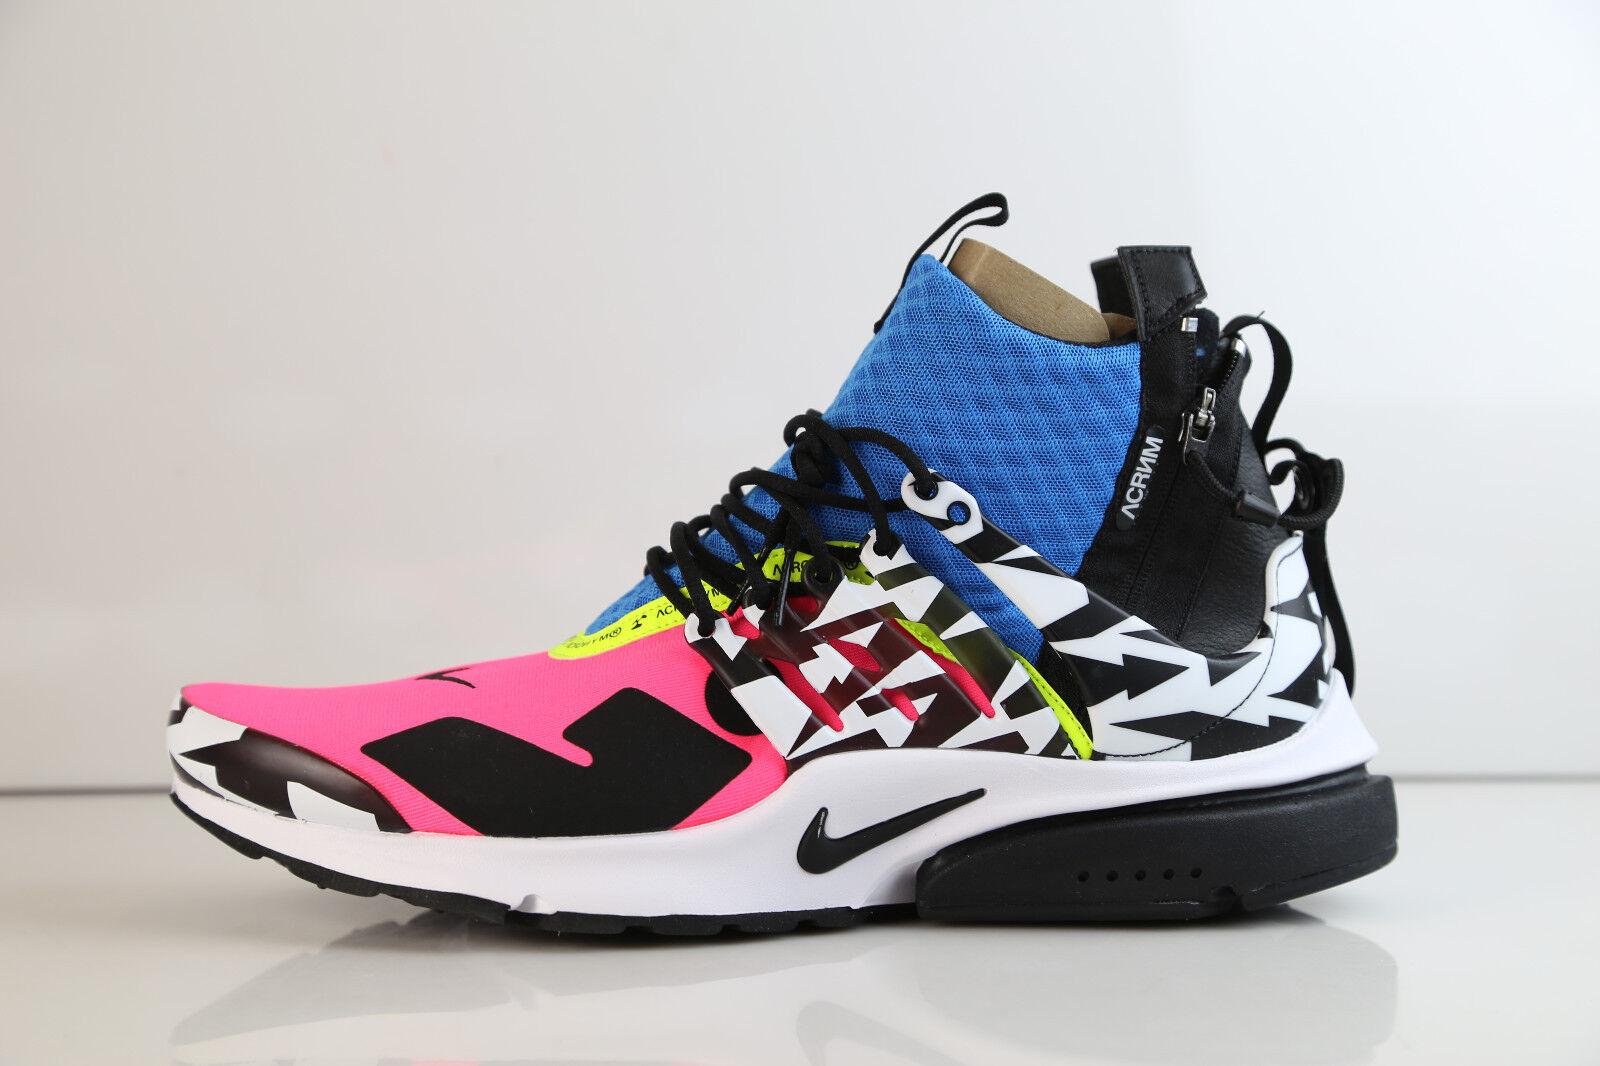 Nike abkrzung luft presto mitte racer rosa rosa rosa foto blau - schwarz 2018 ah7832-600 5 - 14 d0a6e1